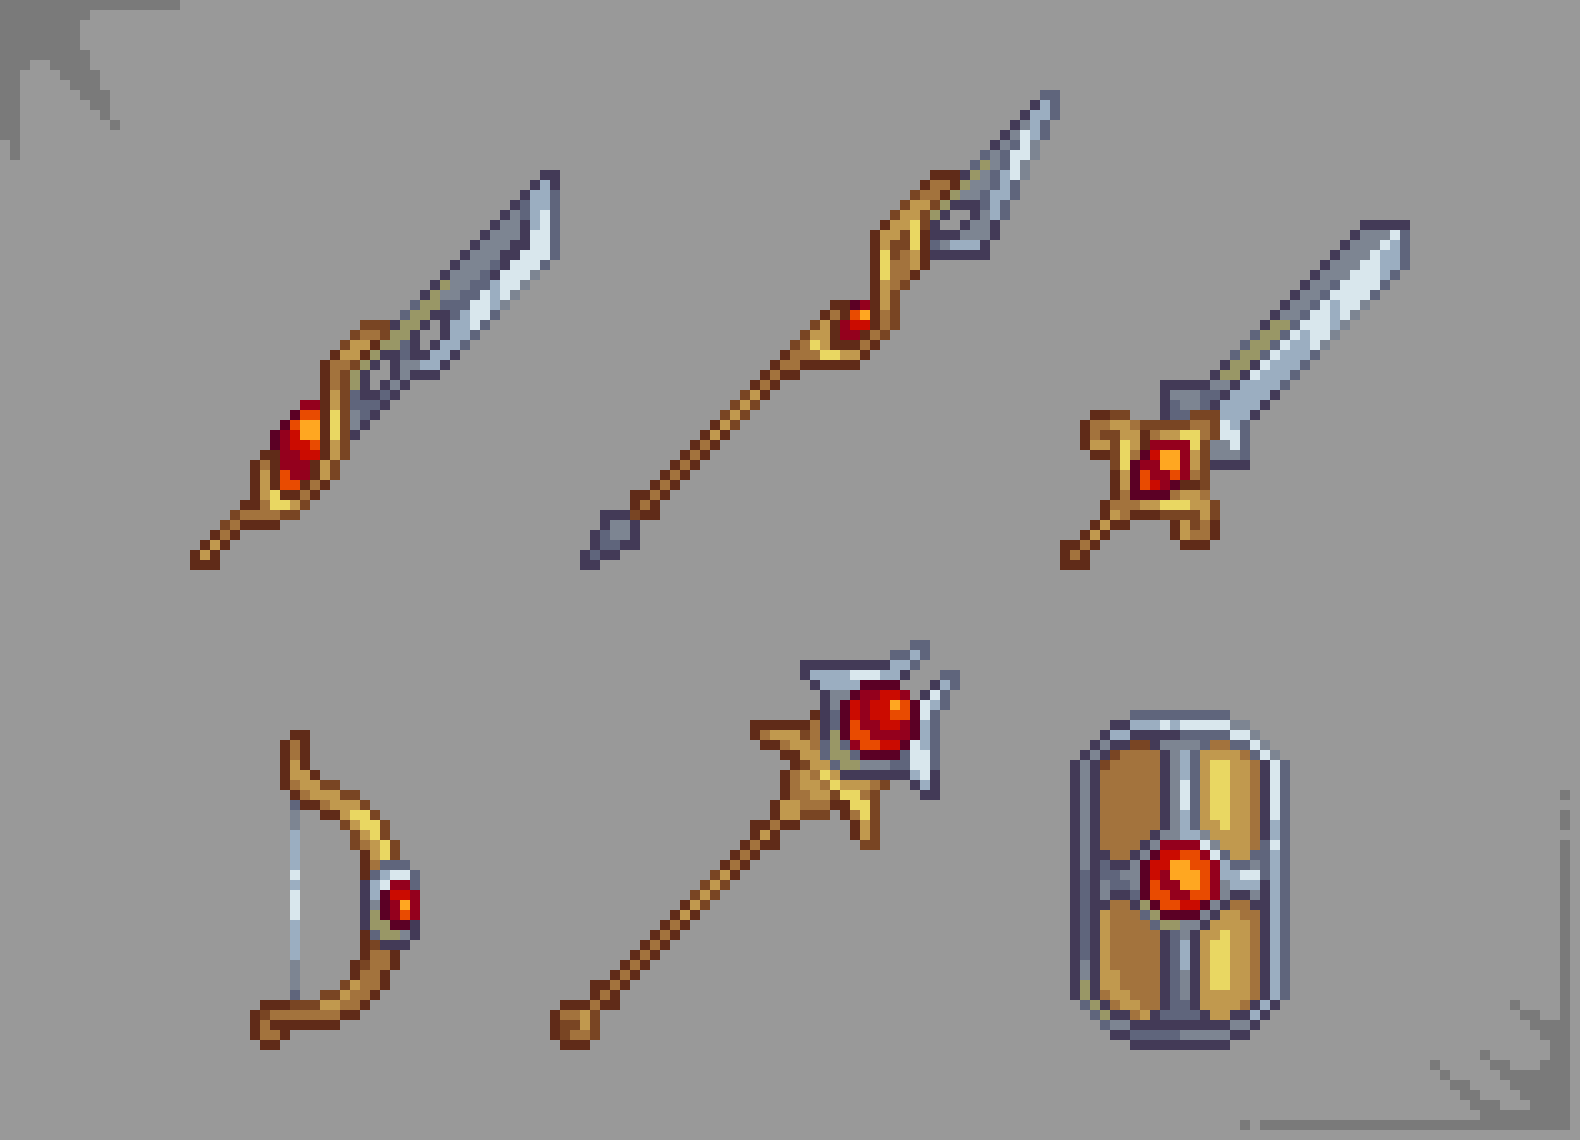 Golden Weaponry